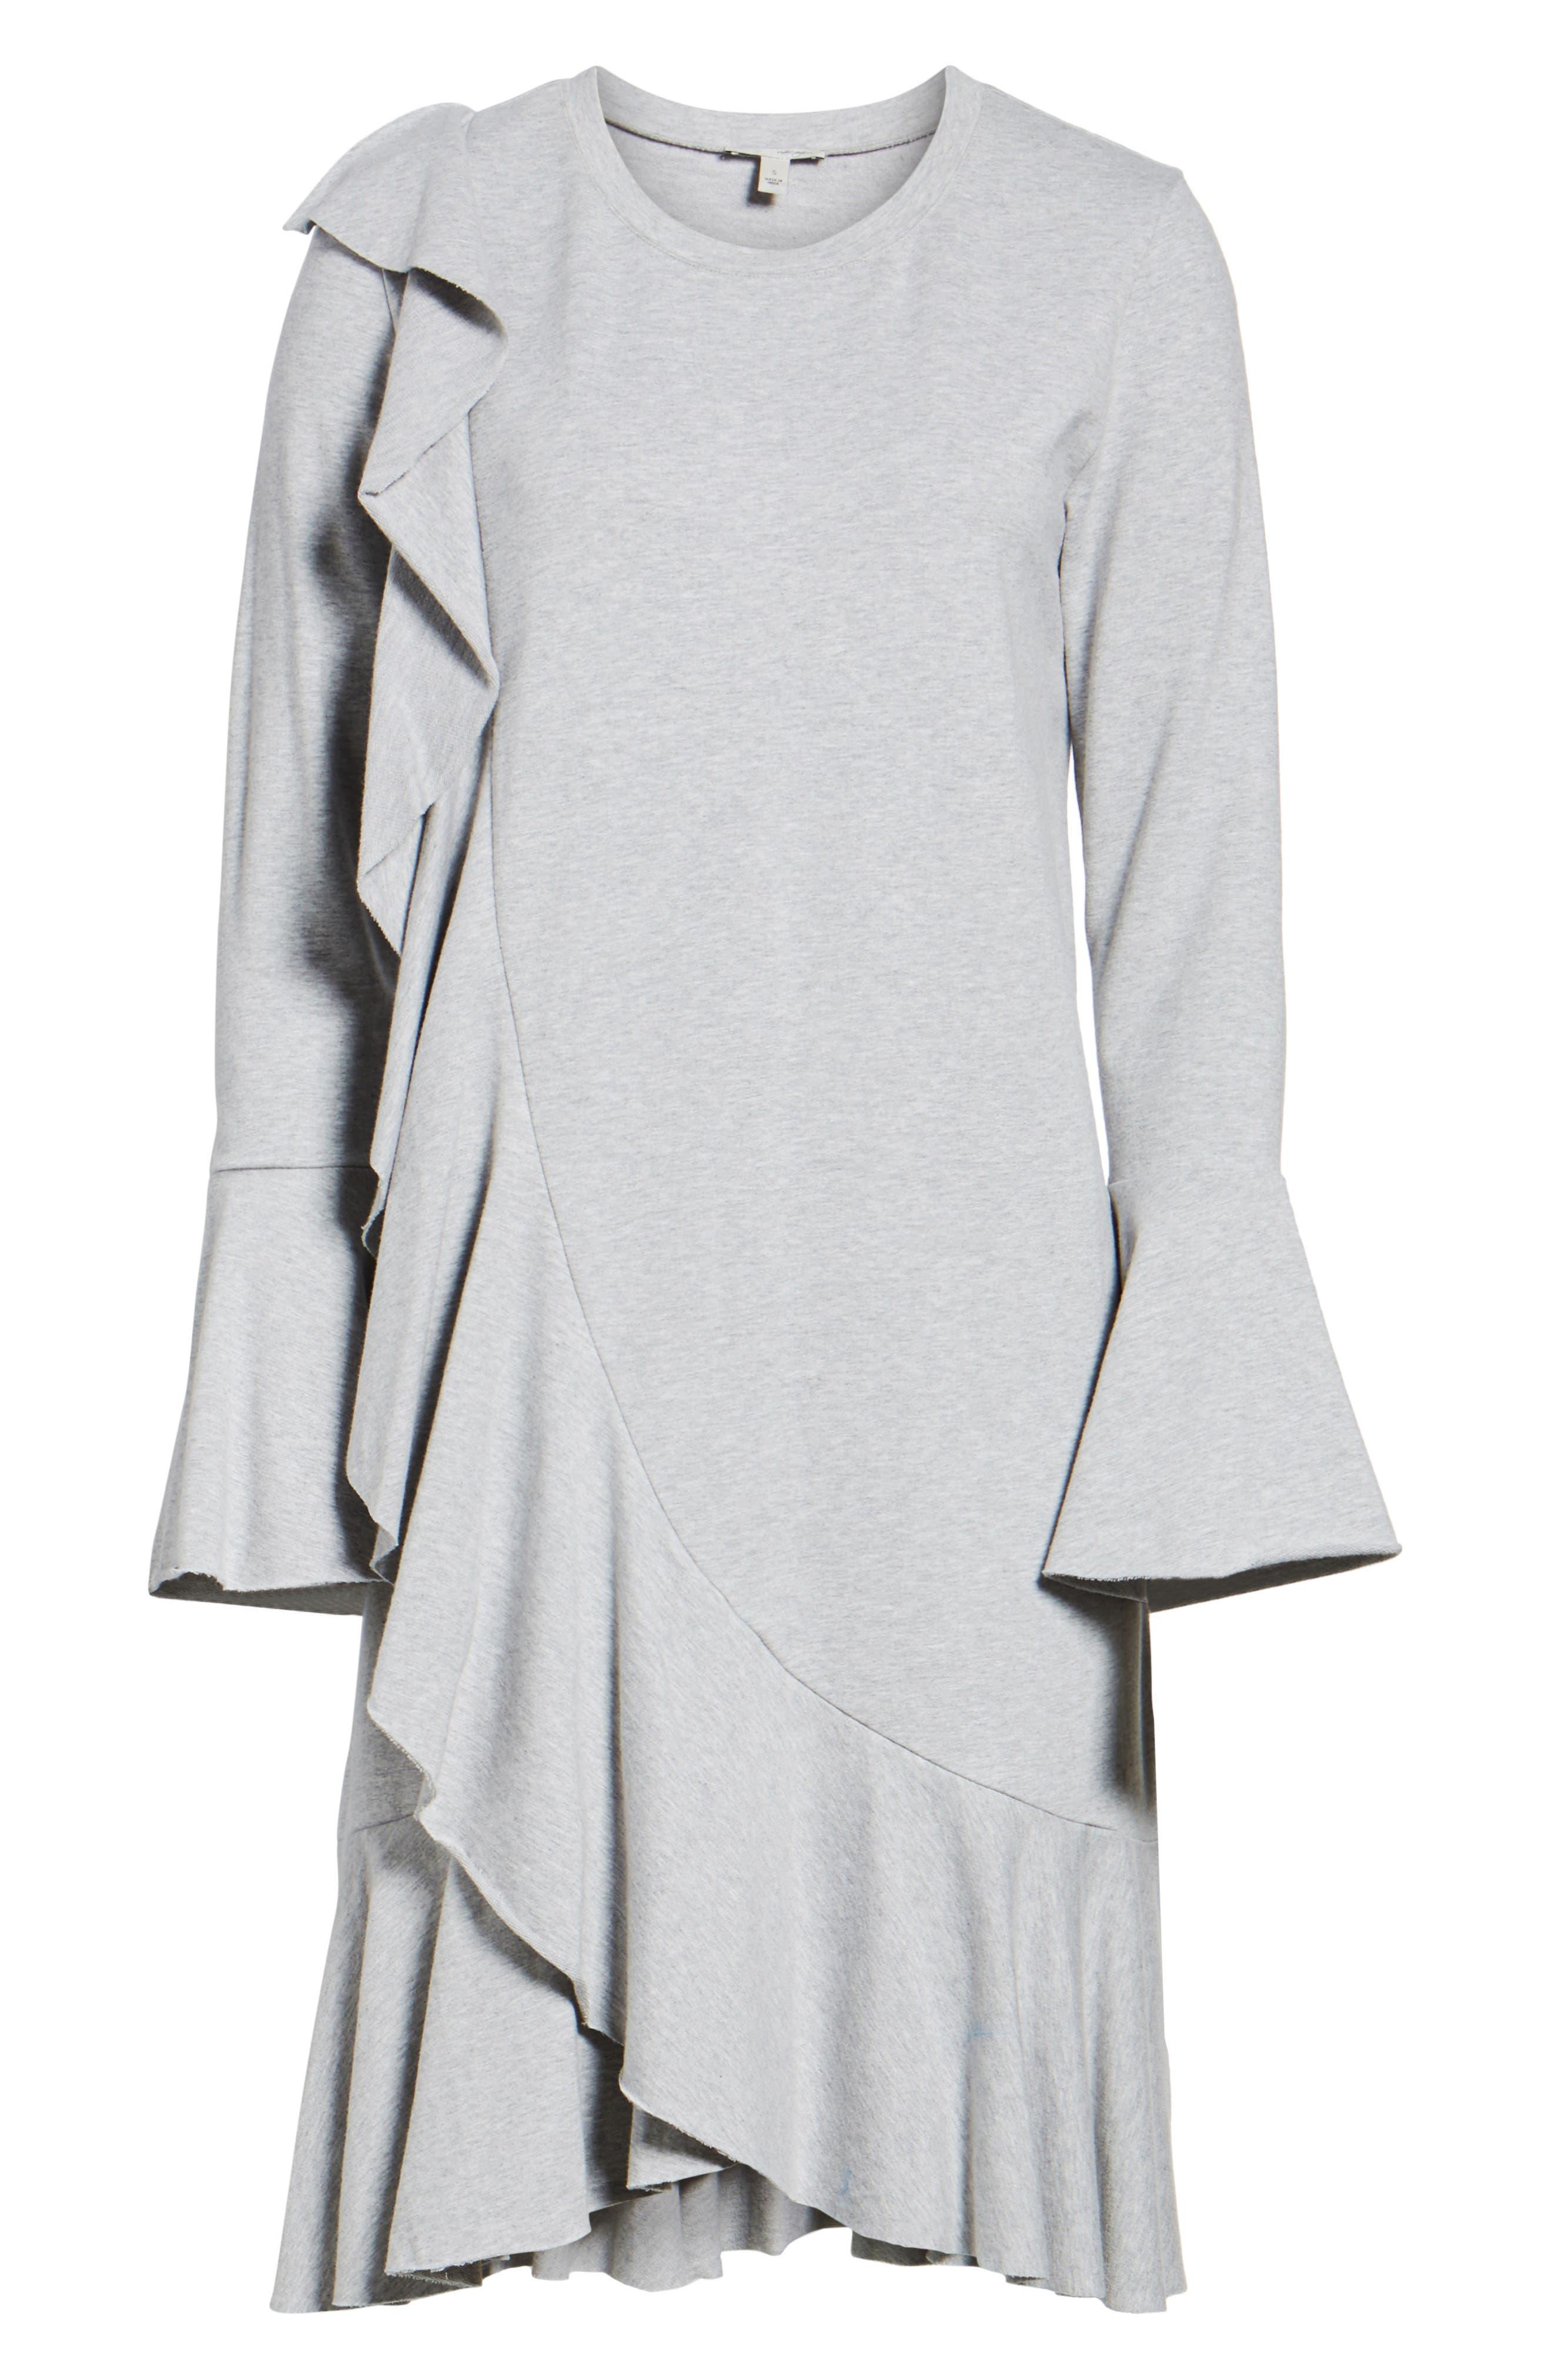 Ruffle Detail Knit Dress,                             Alternate thumbnail 19, color,